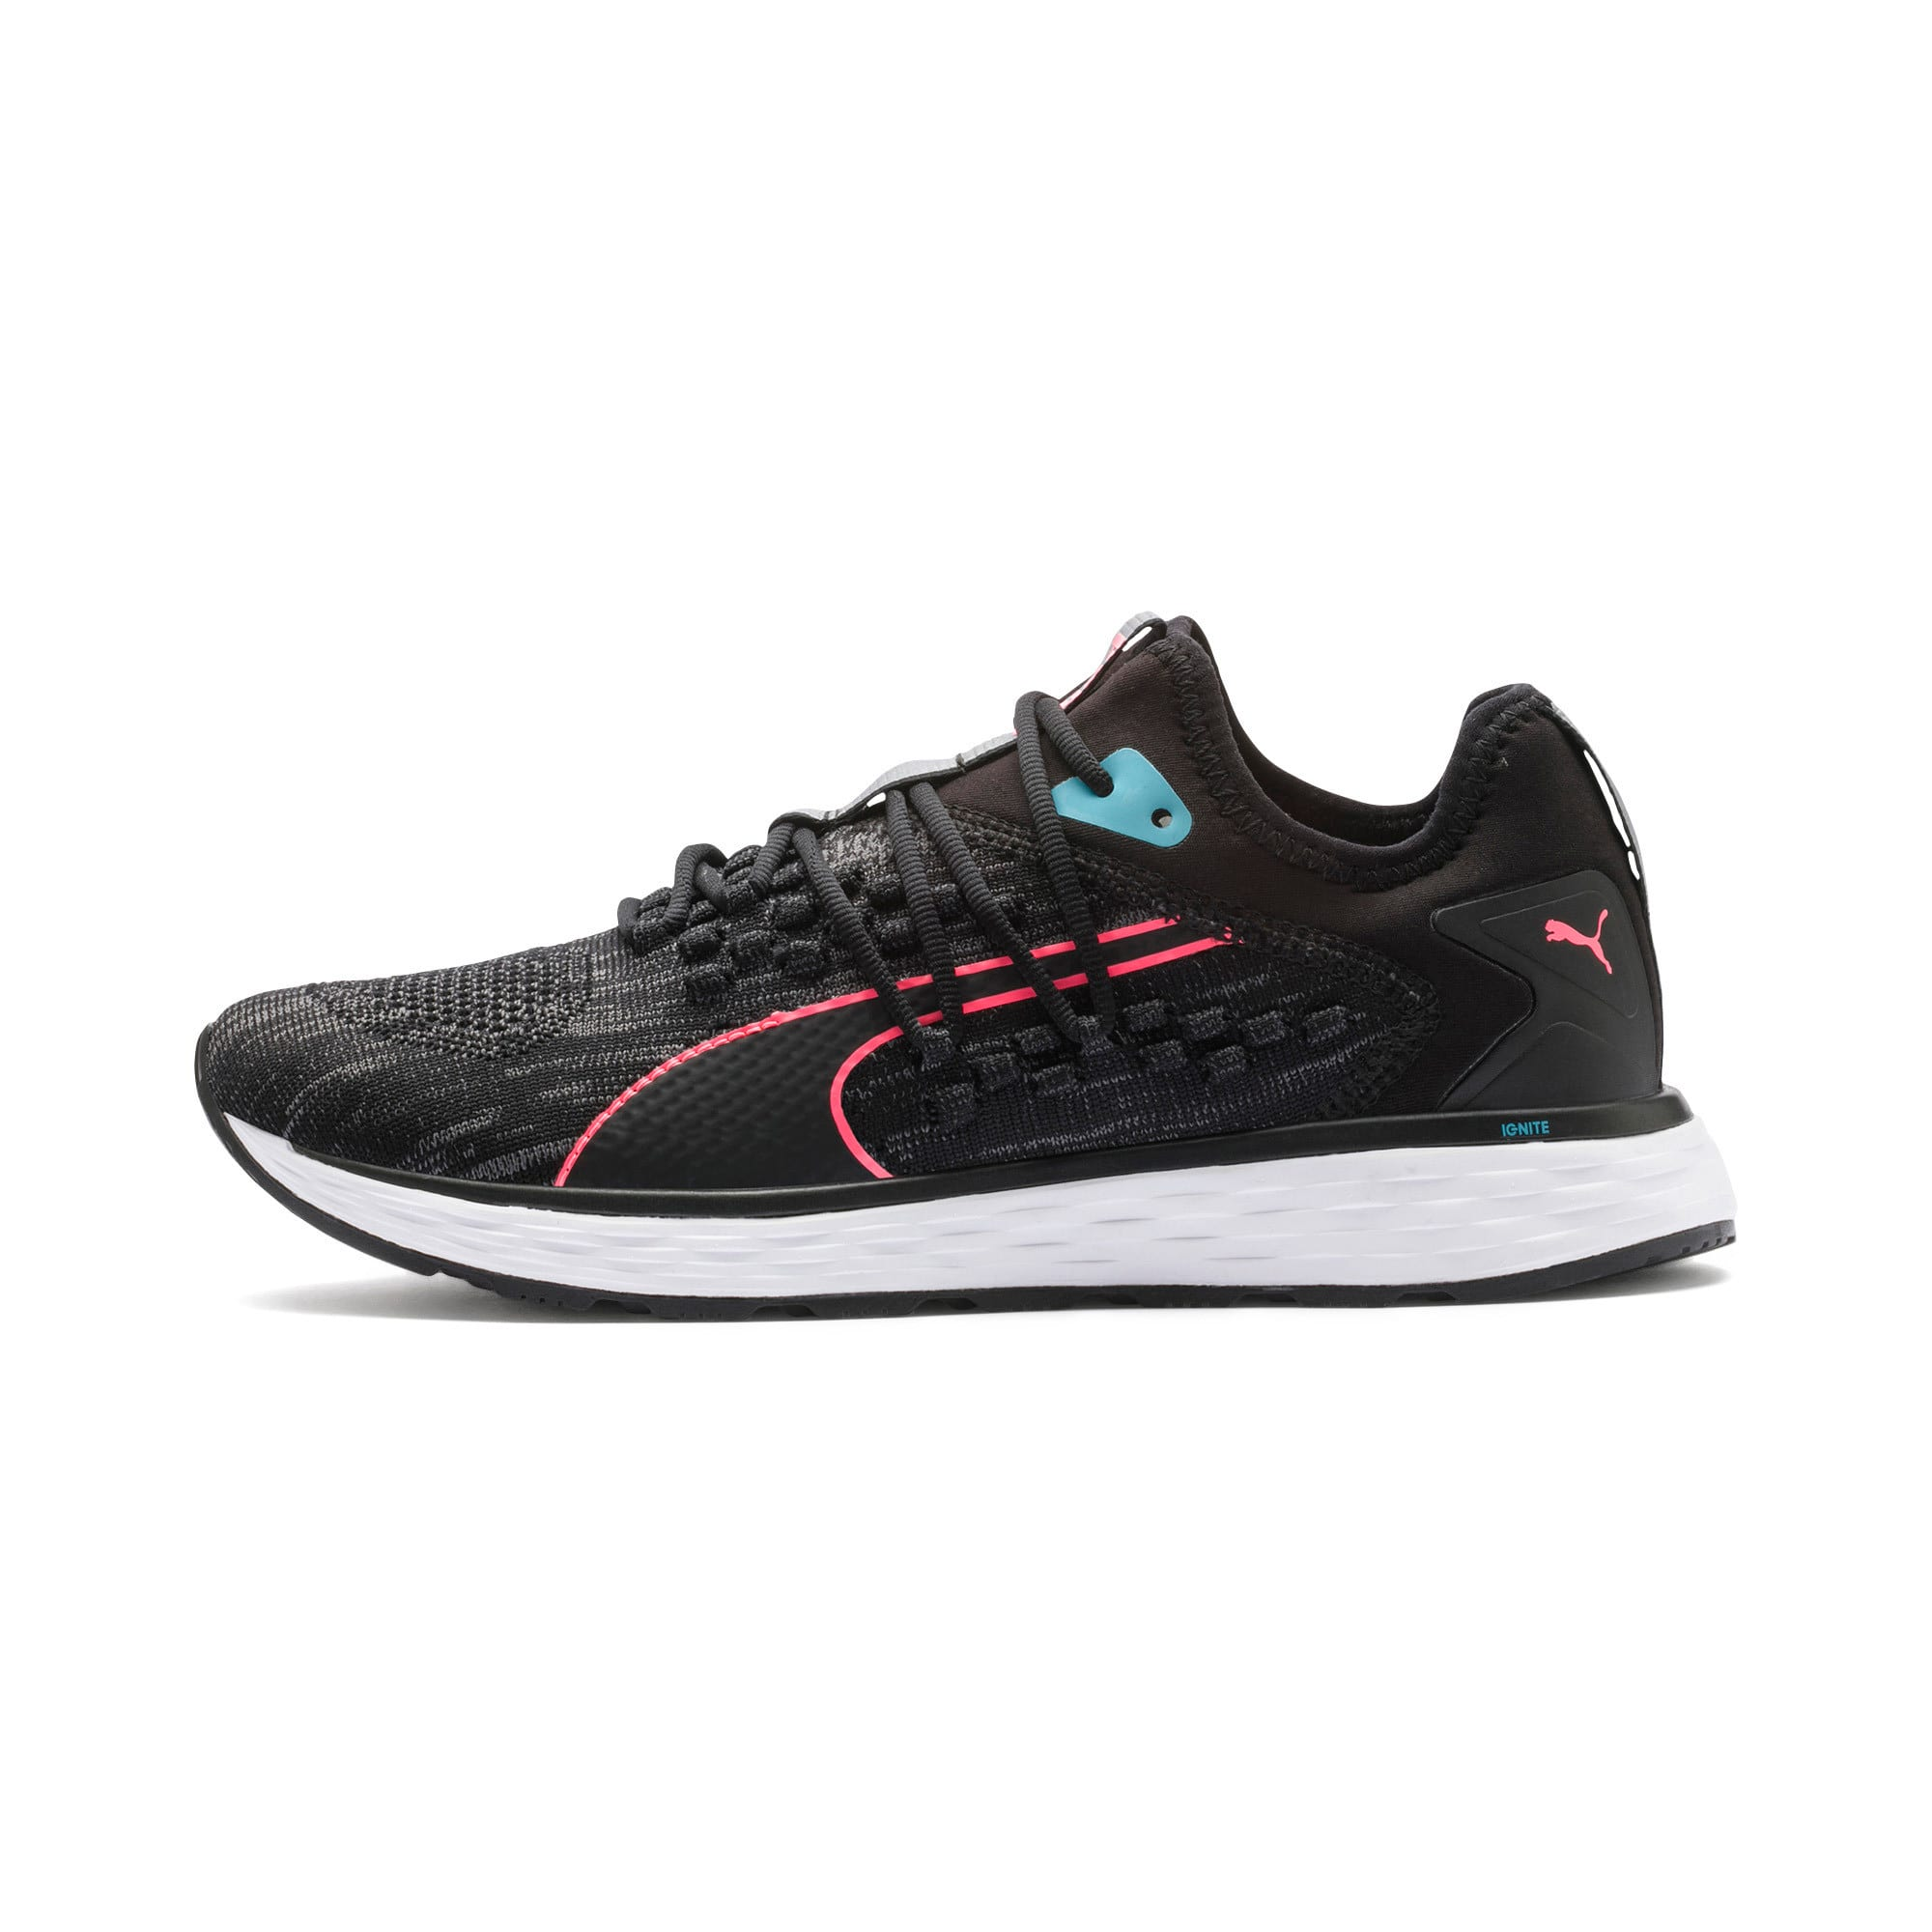 Thumbnail 1 of SPEED FUSEFIT Women's Running Shoes, Puma Black-Milky Blue, medium-IND